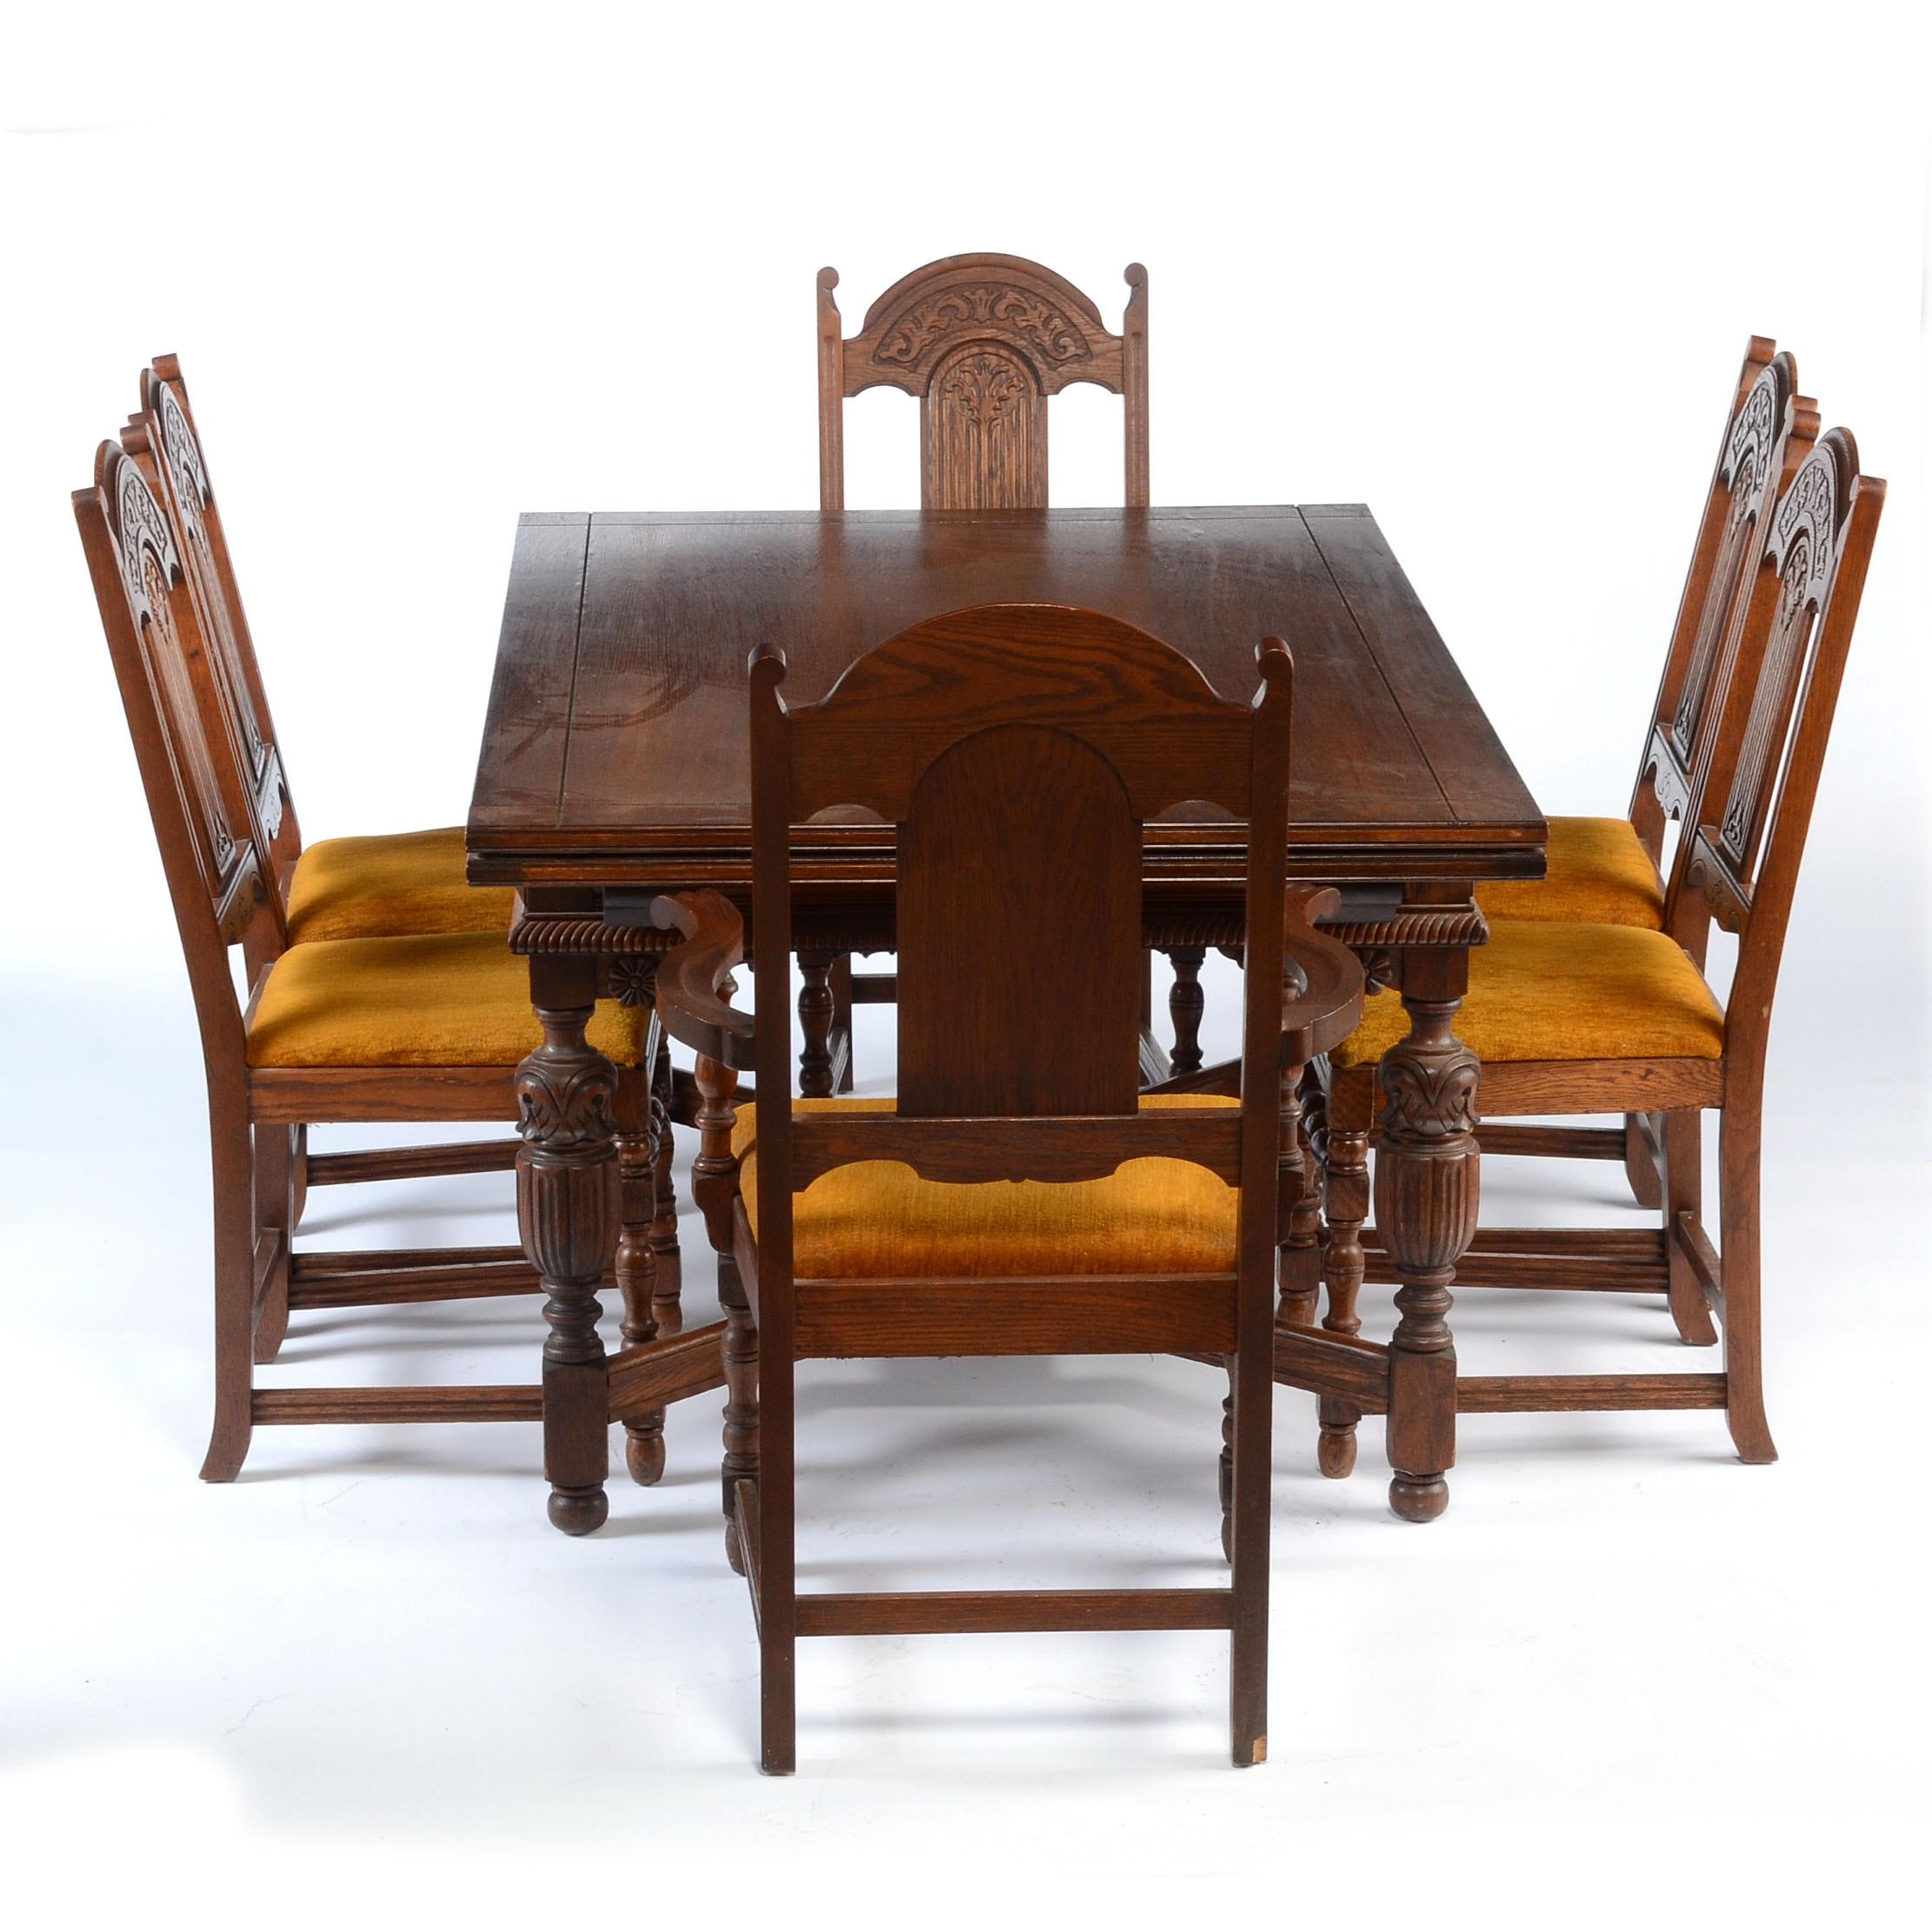 1920s English Tudor Revival Dining Furniture ...